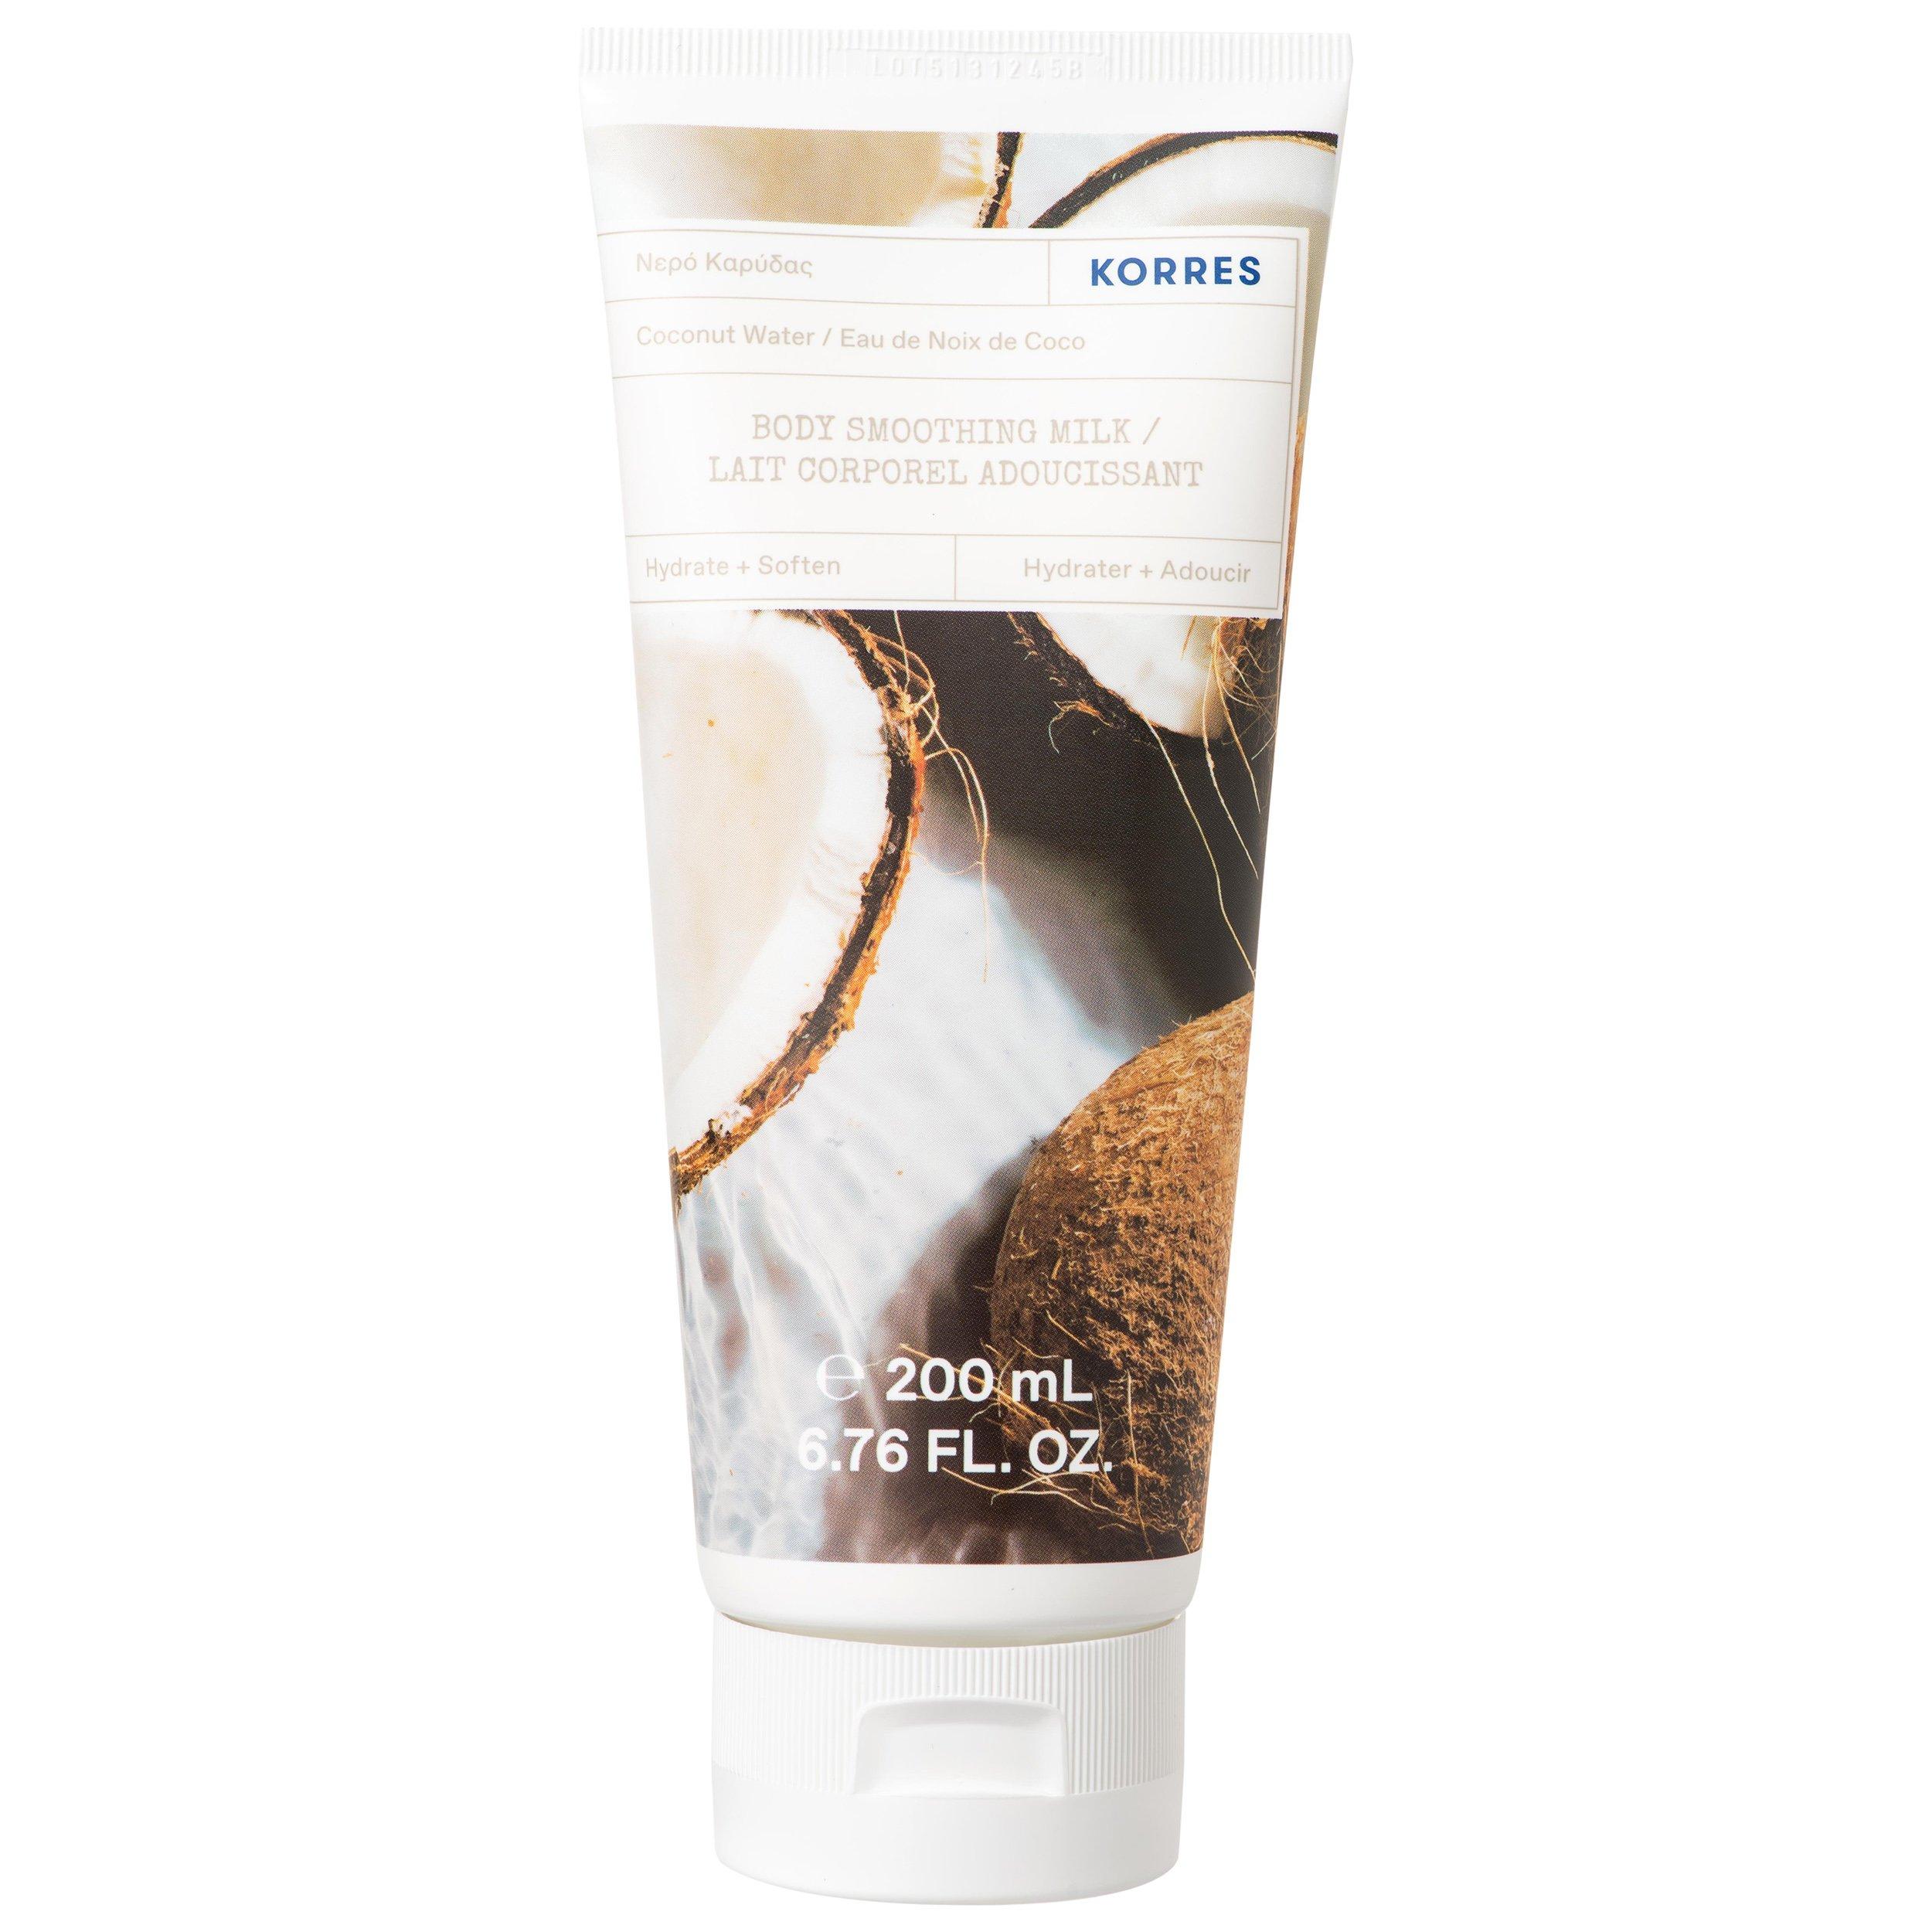 Korres Coconut Water Body Smoothing Milk Γαλάκτωμα Σώματος με Νερό Καρύδας 200ml